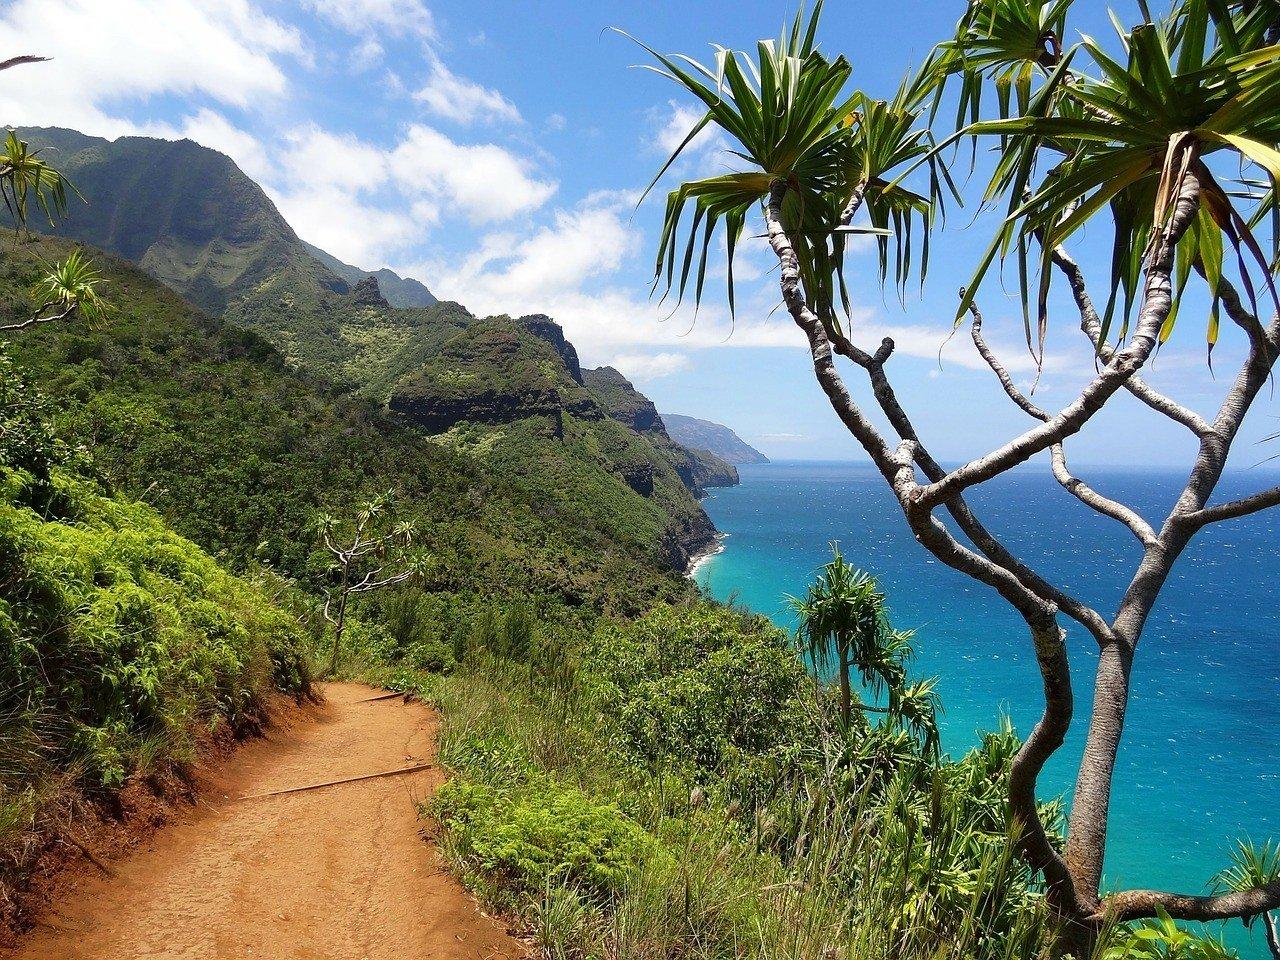 Coastal views of the tropica island vacation spot Kauai in Hawaii